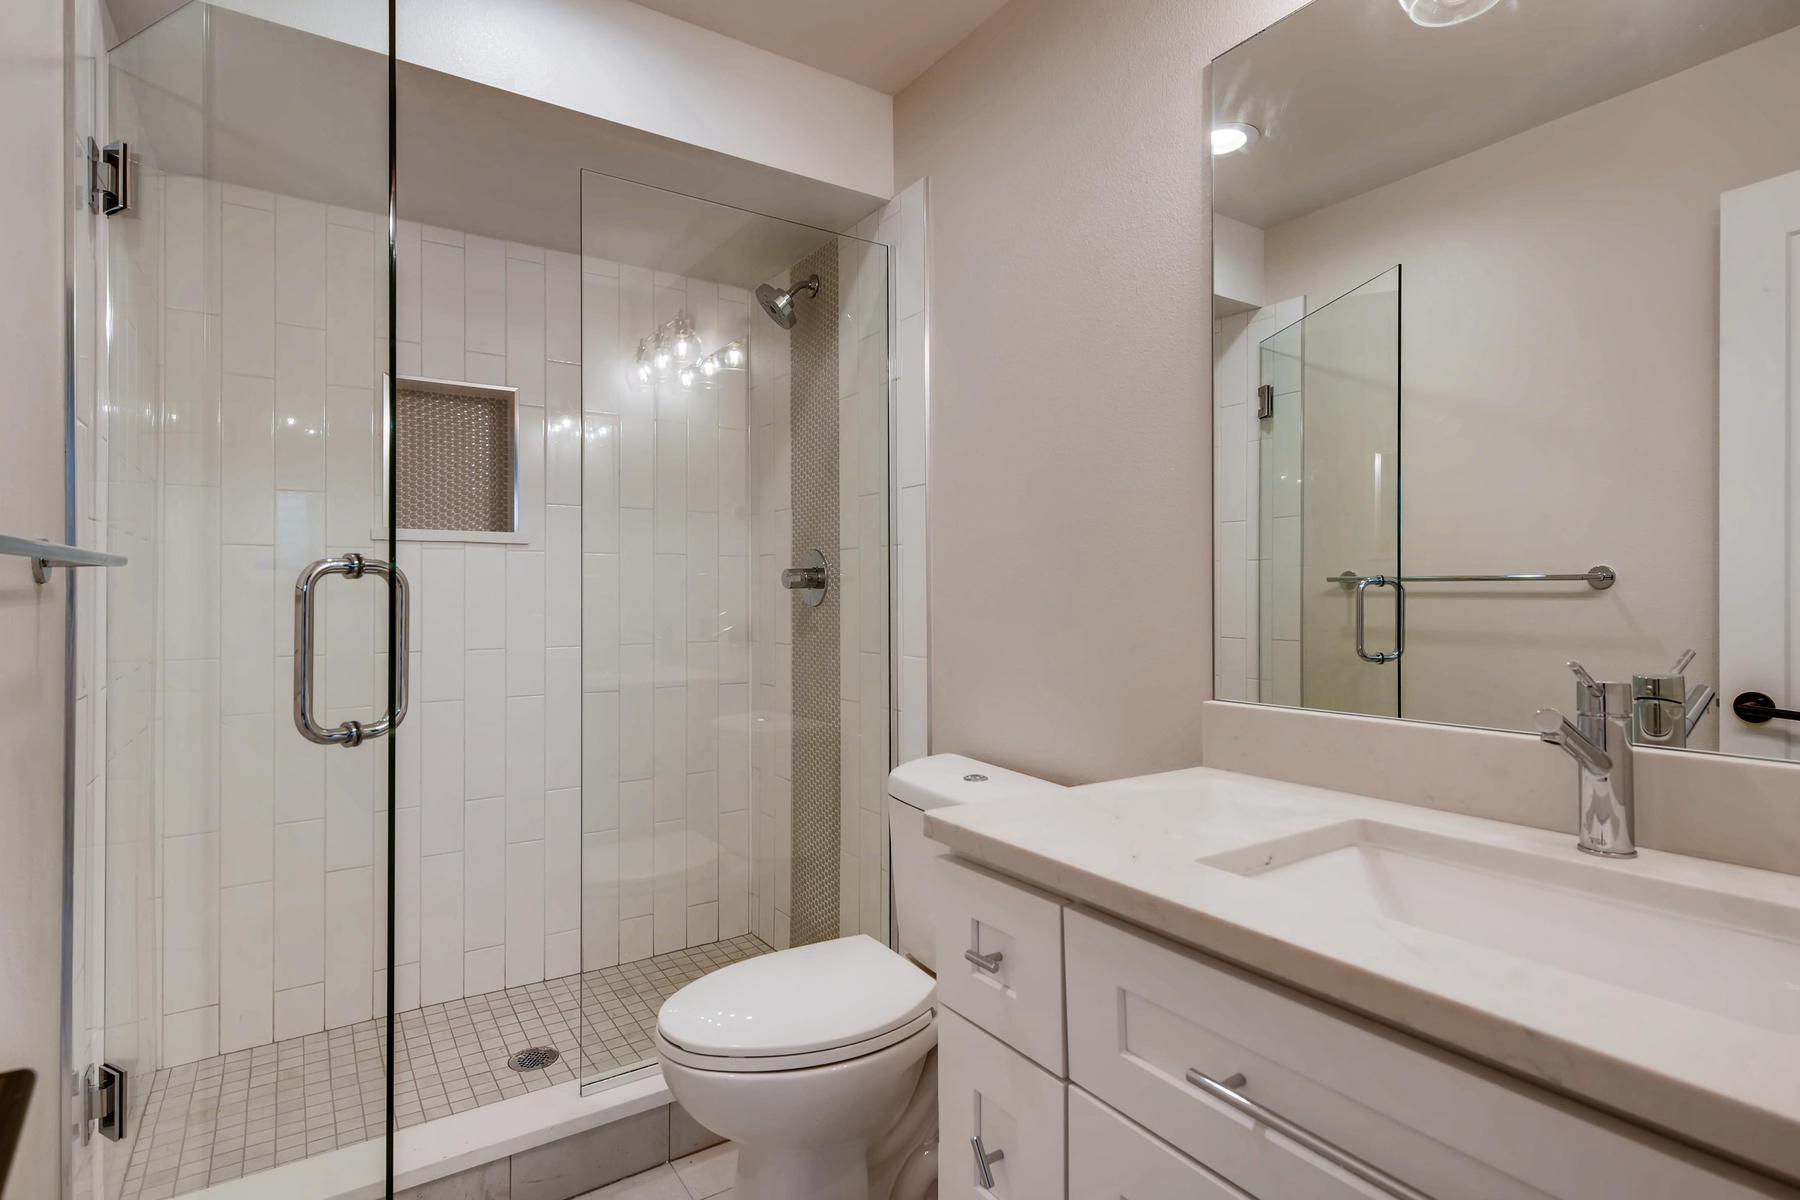 2988 S Elati Street Englewood-022-12-Lower Level Bathroom-MLS_Size.jpg